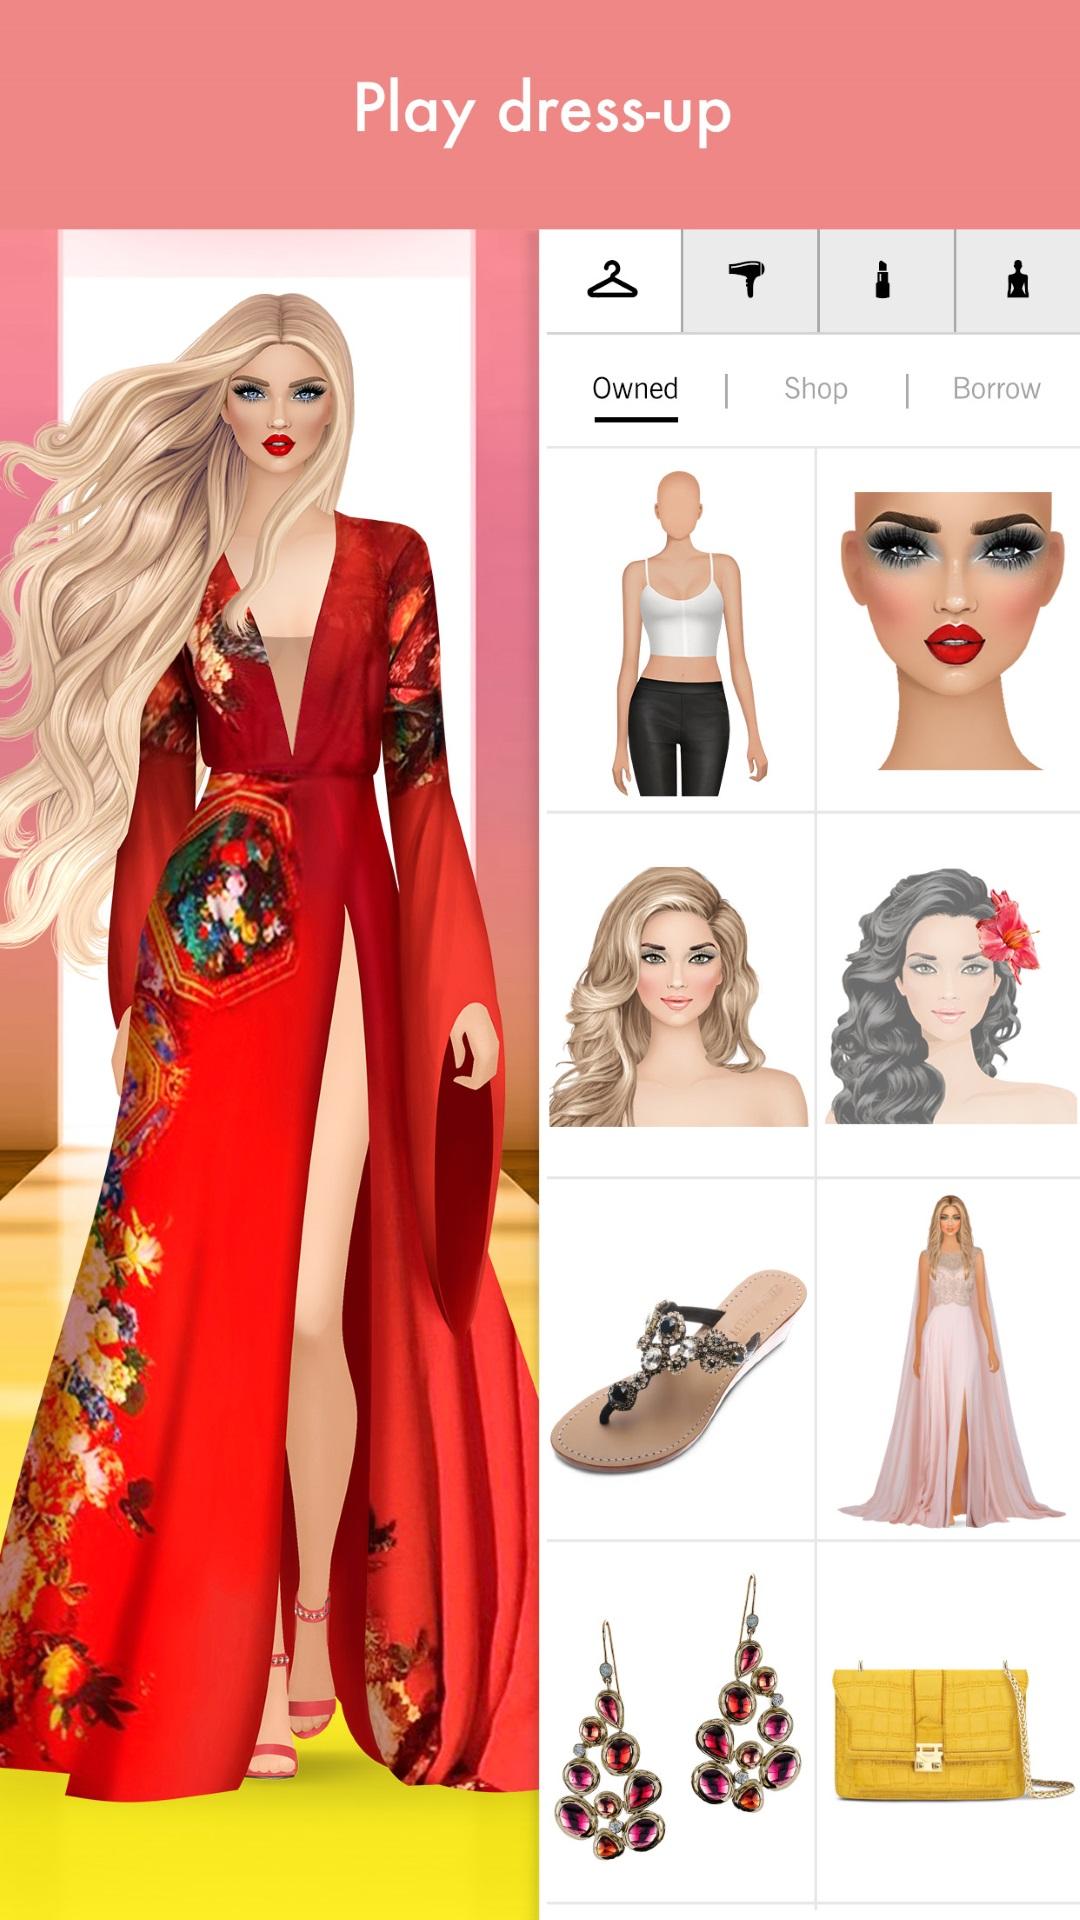 Covet Fashion Dress Up Game Dresses | Saddha